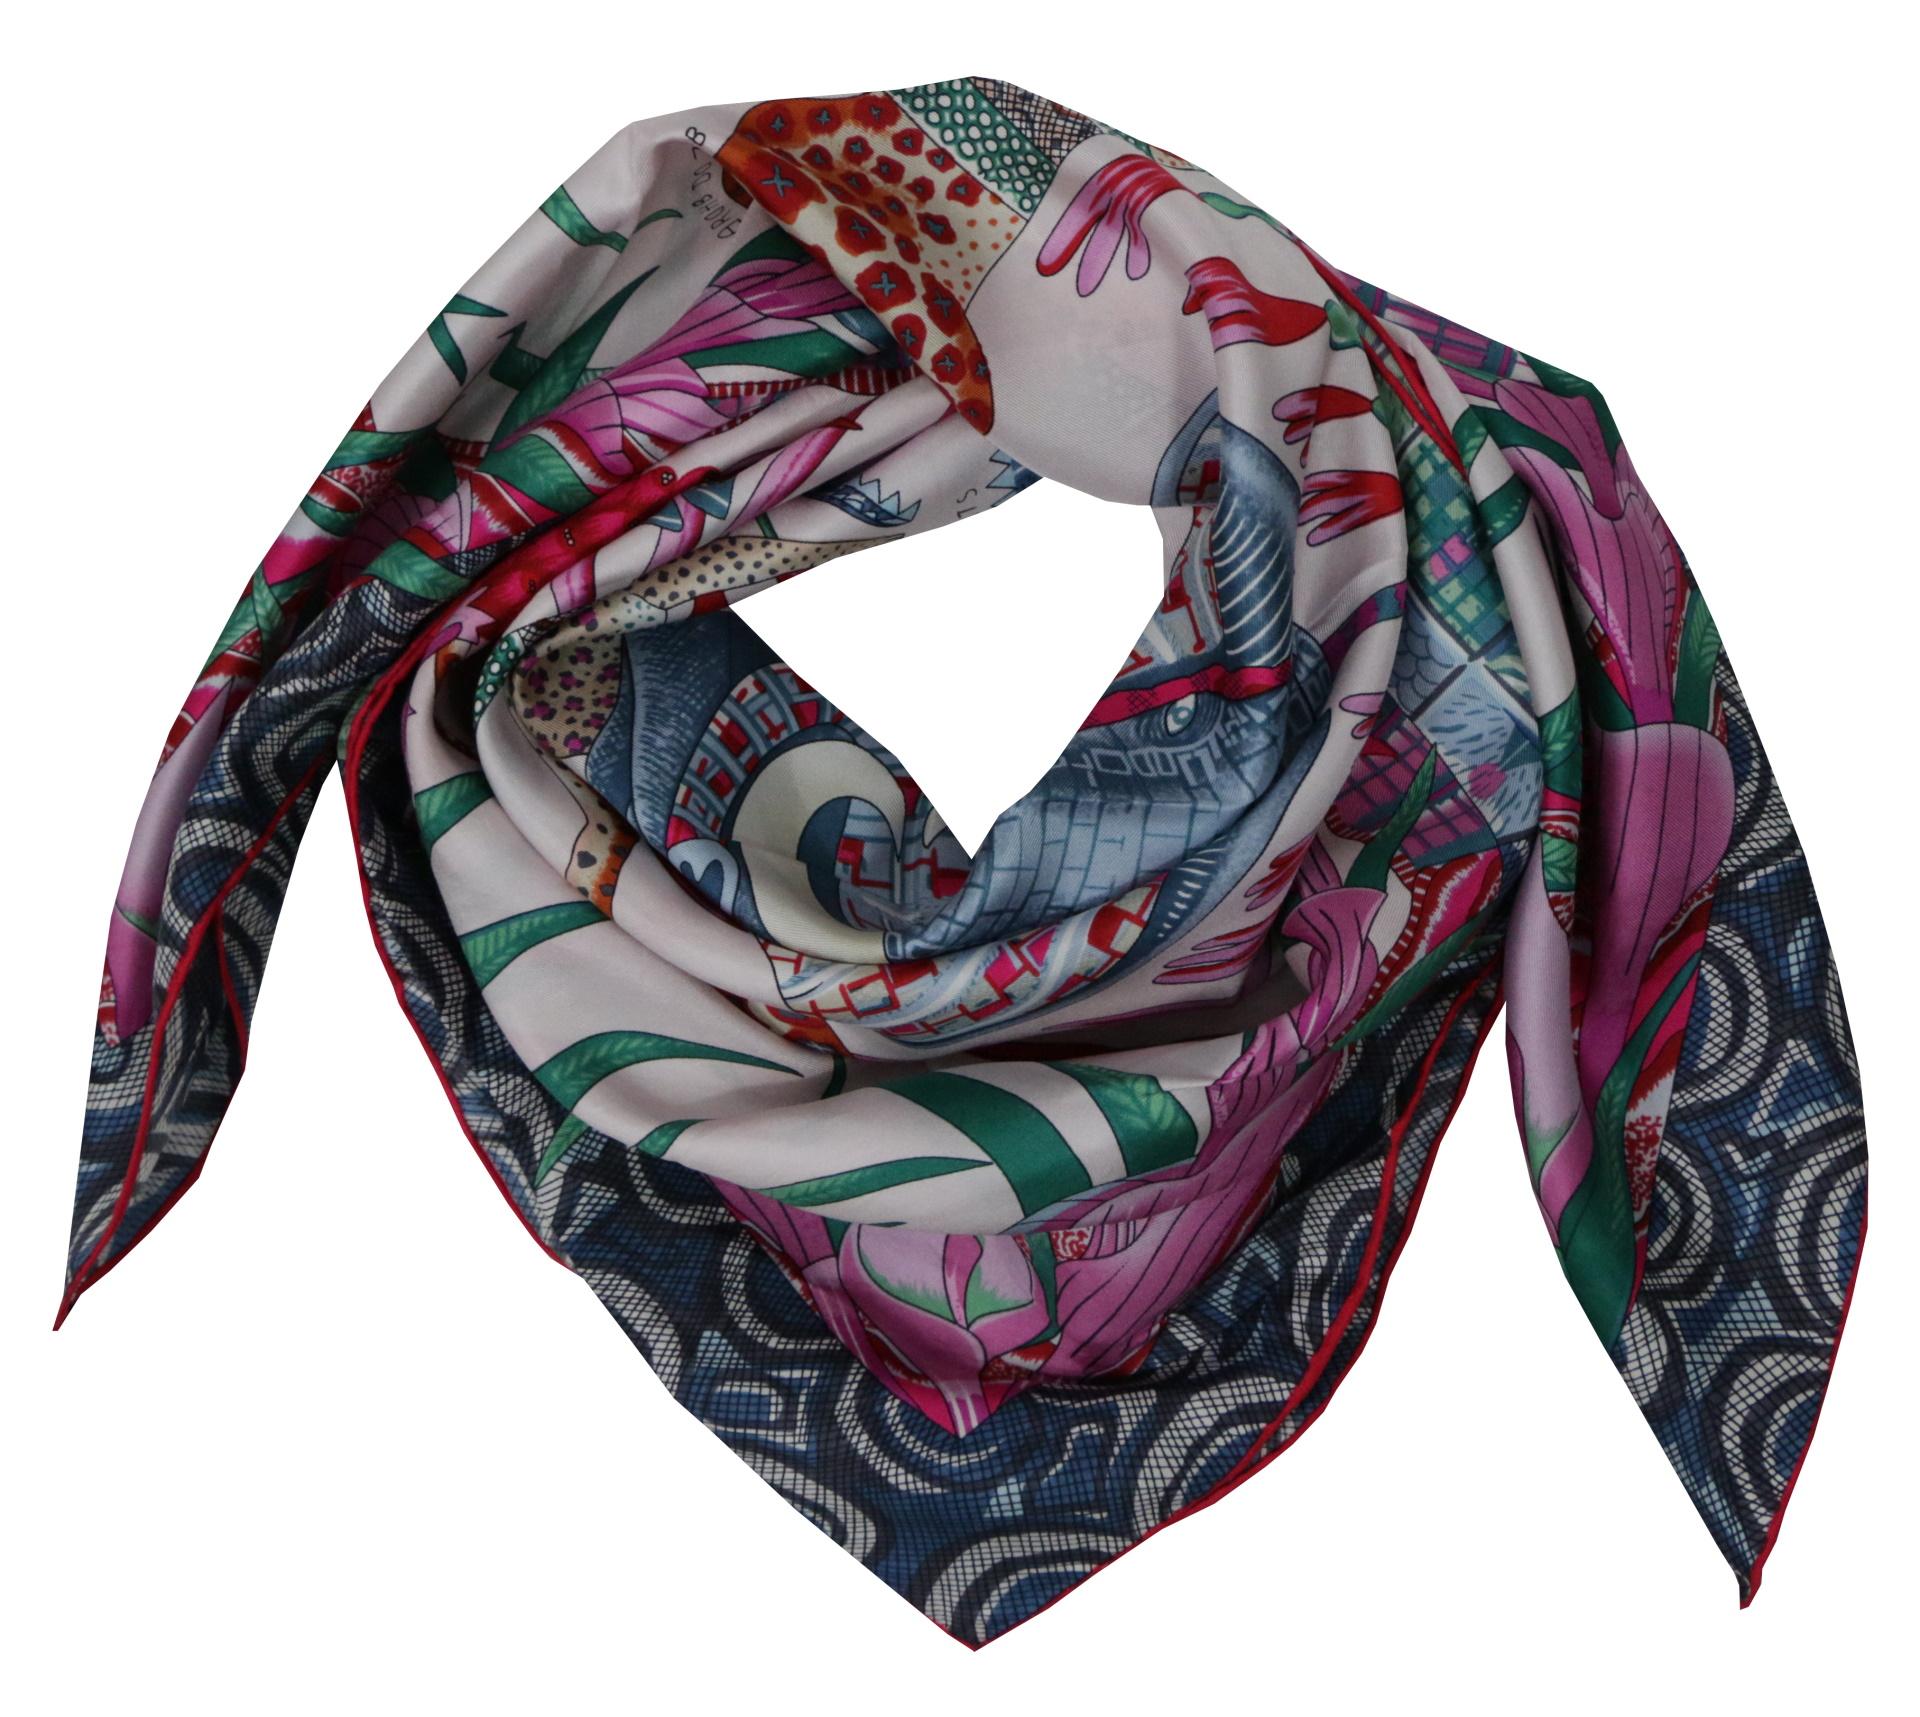 FOULARD H FOULARD SCIARPA DONNA 100 SETA 90CMX90CM 1 1stAmerican foulard/sciarpa 100% seta da donna 90cmx90cm